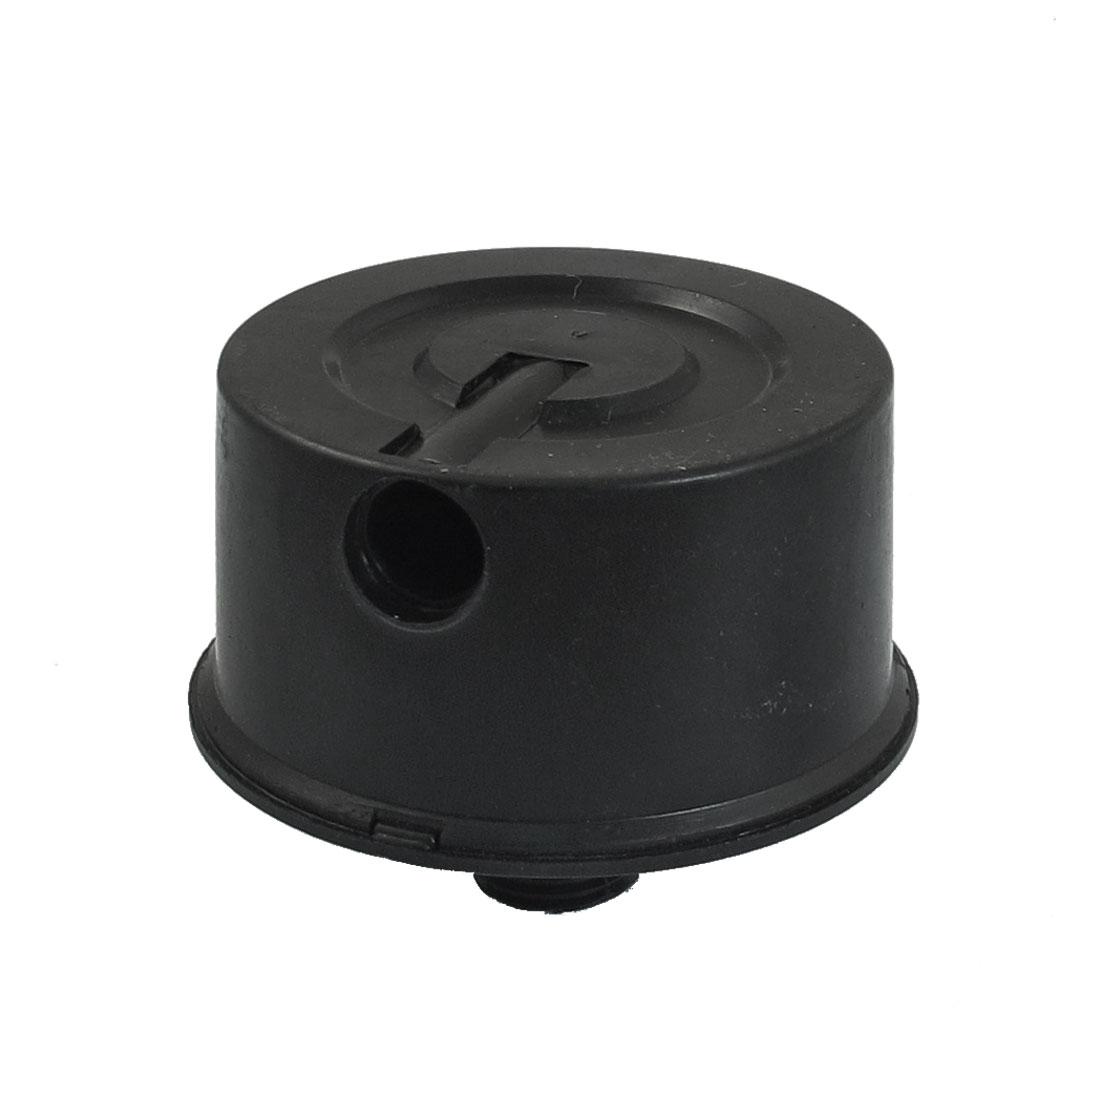 Air Compressor Admitting Port Muffler Silencer Black 16mm Thread